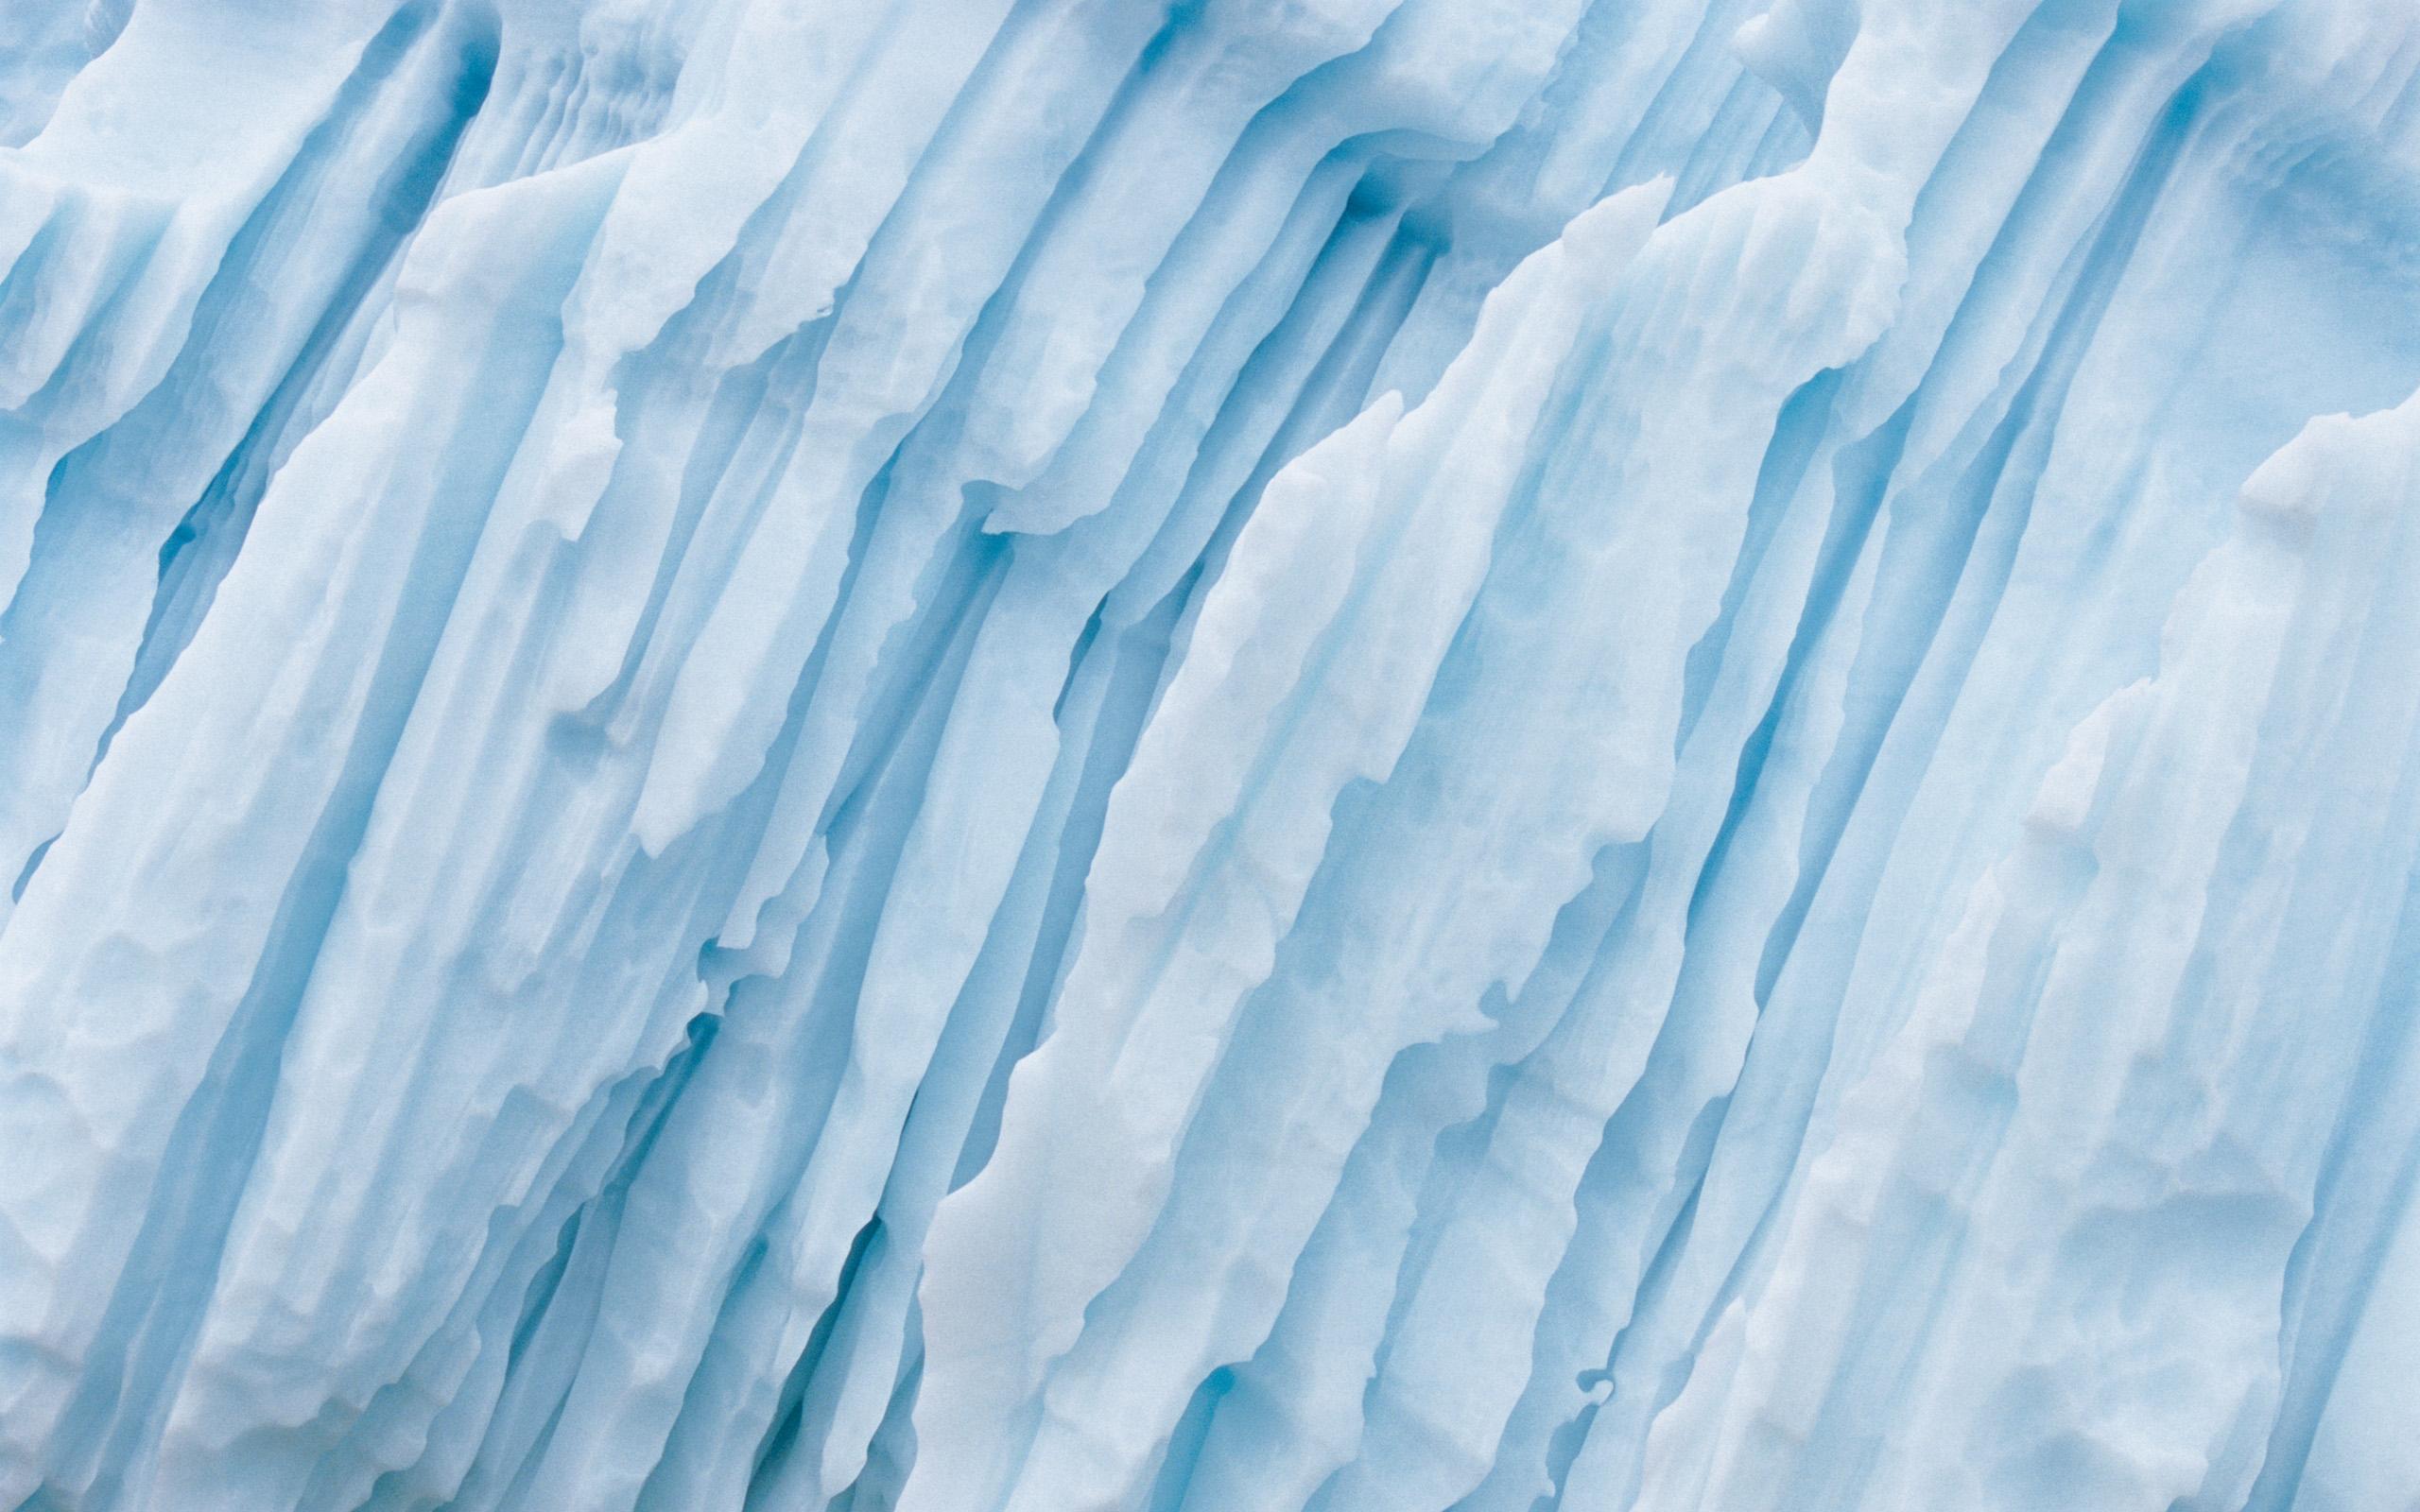 iceberg wallpaper south pole